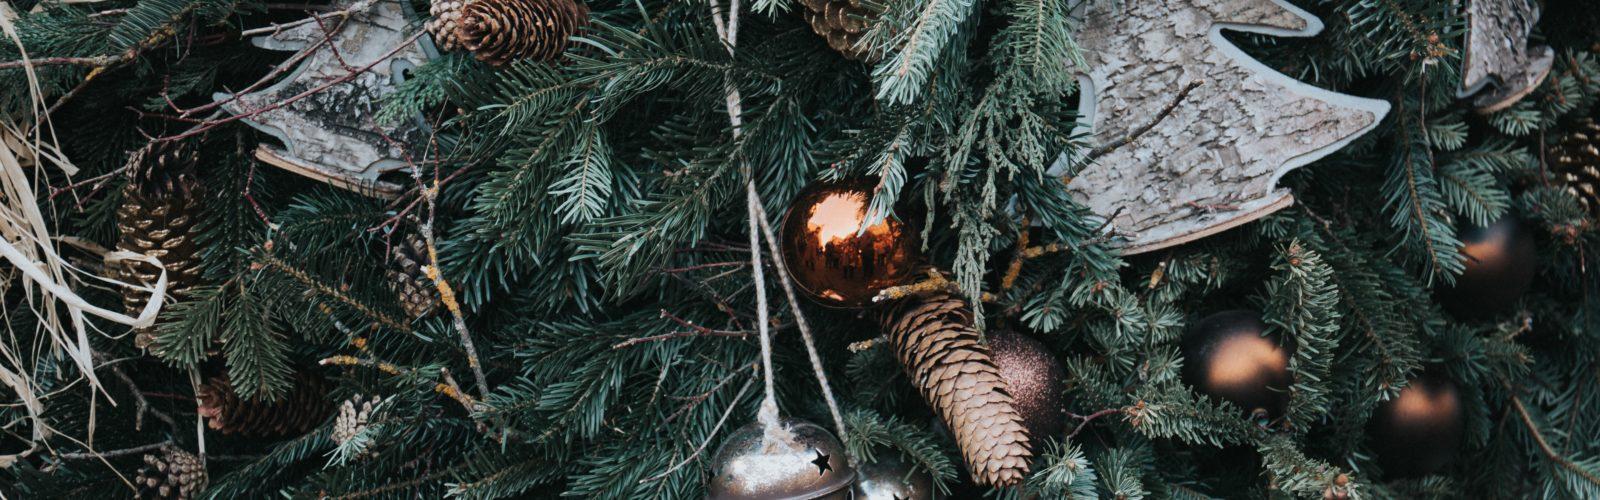 Grand Marché de Noël le 28 Novembre